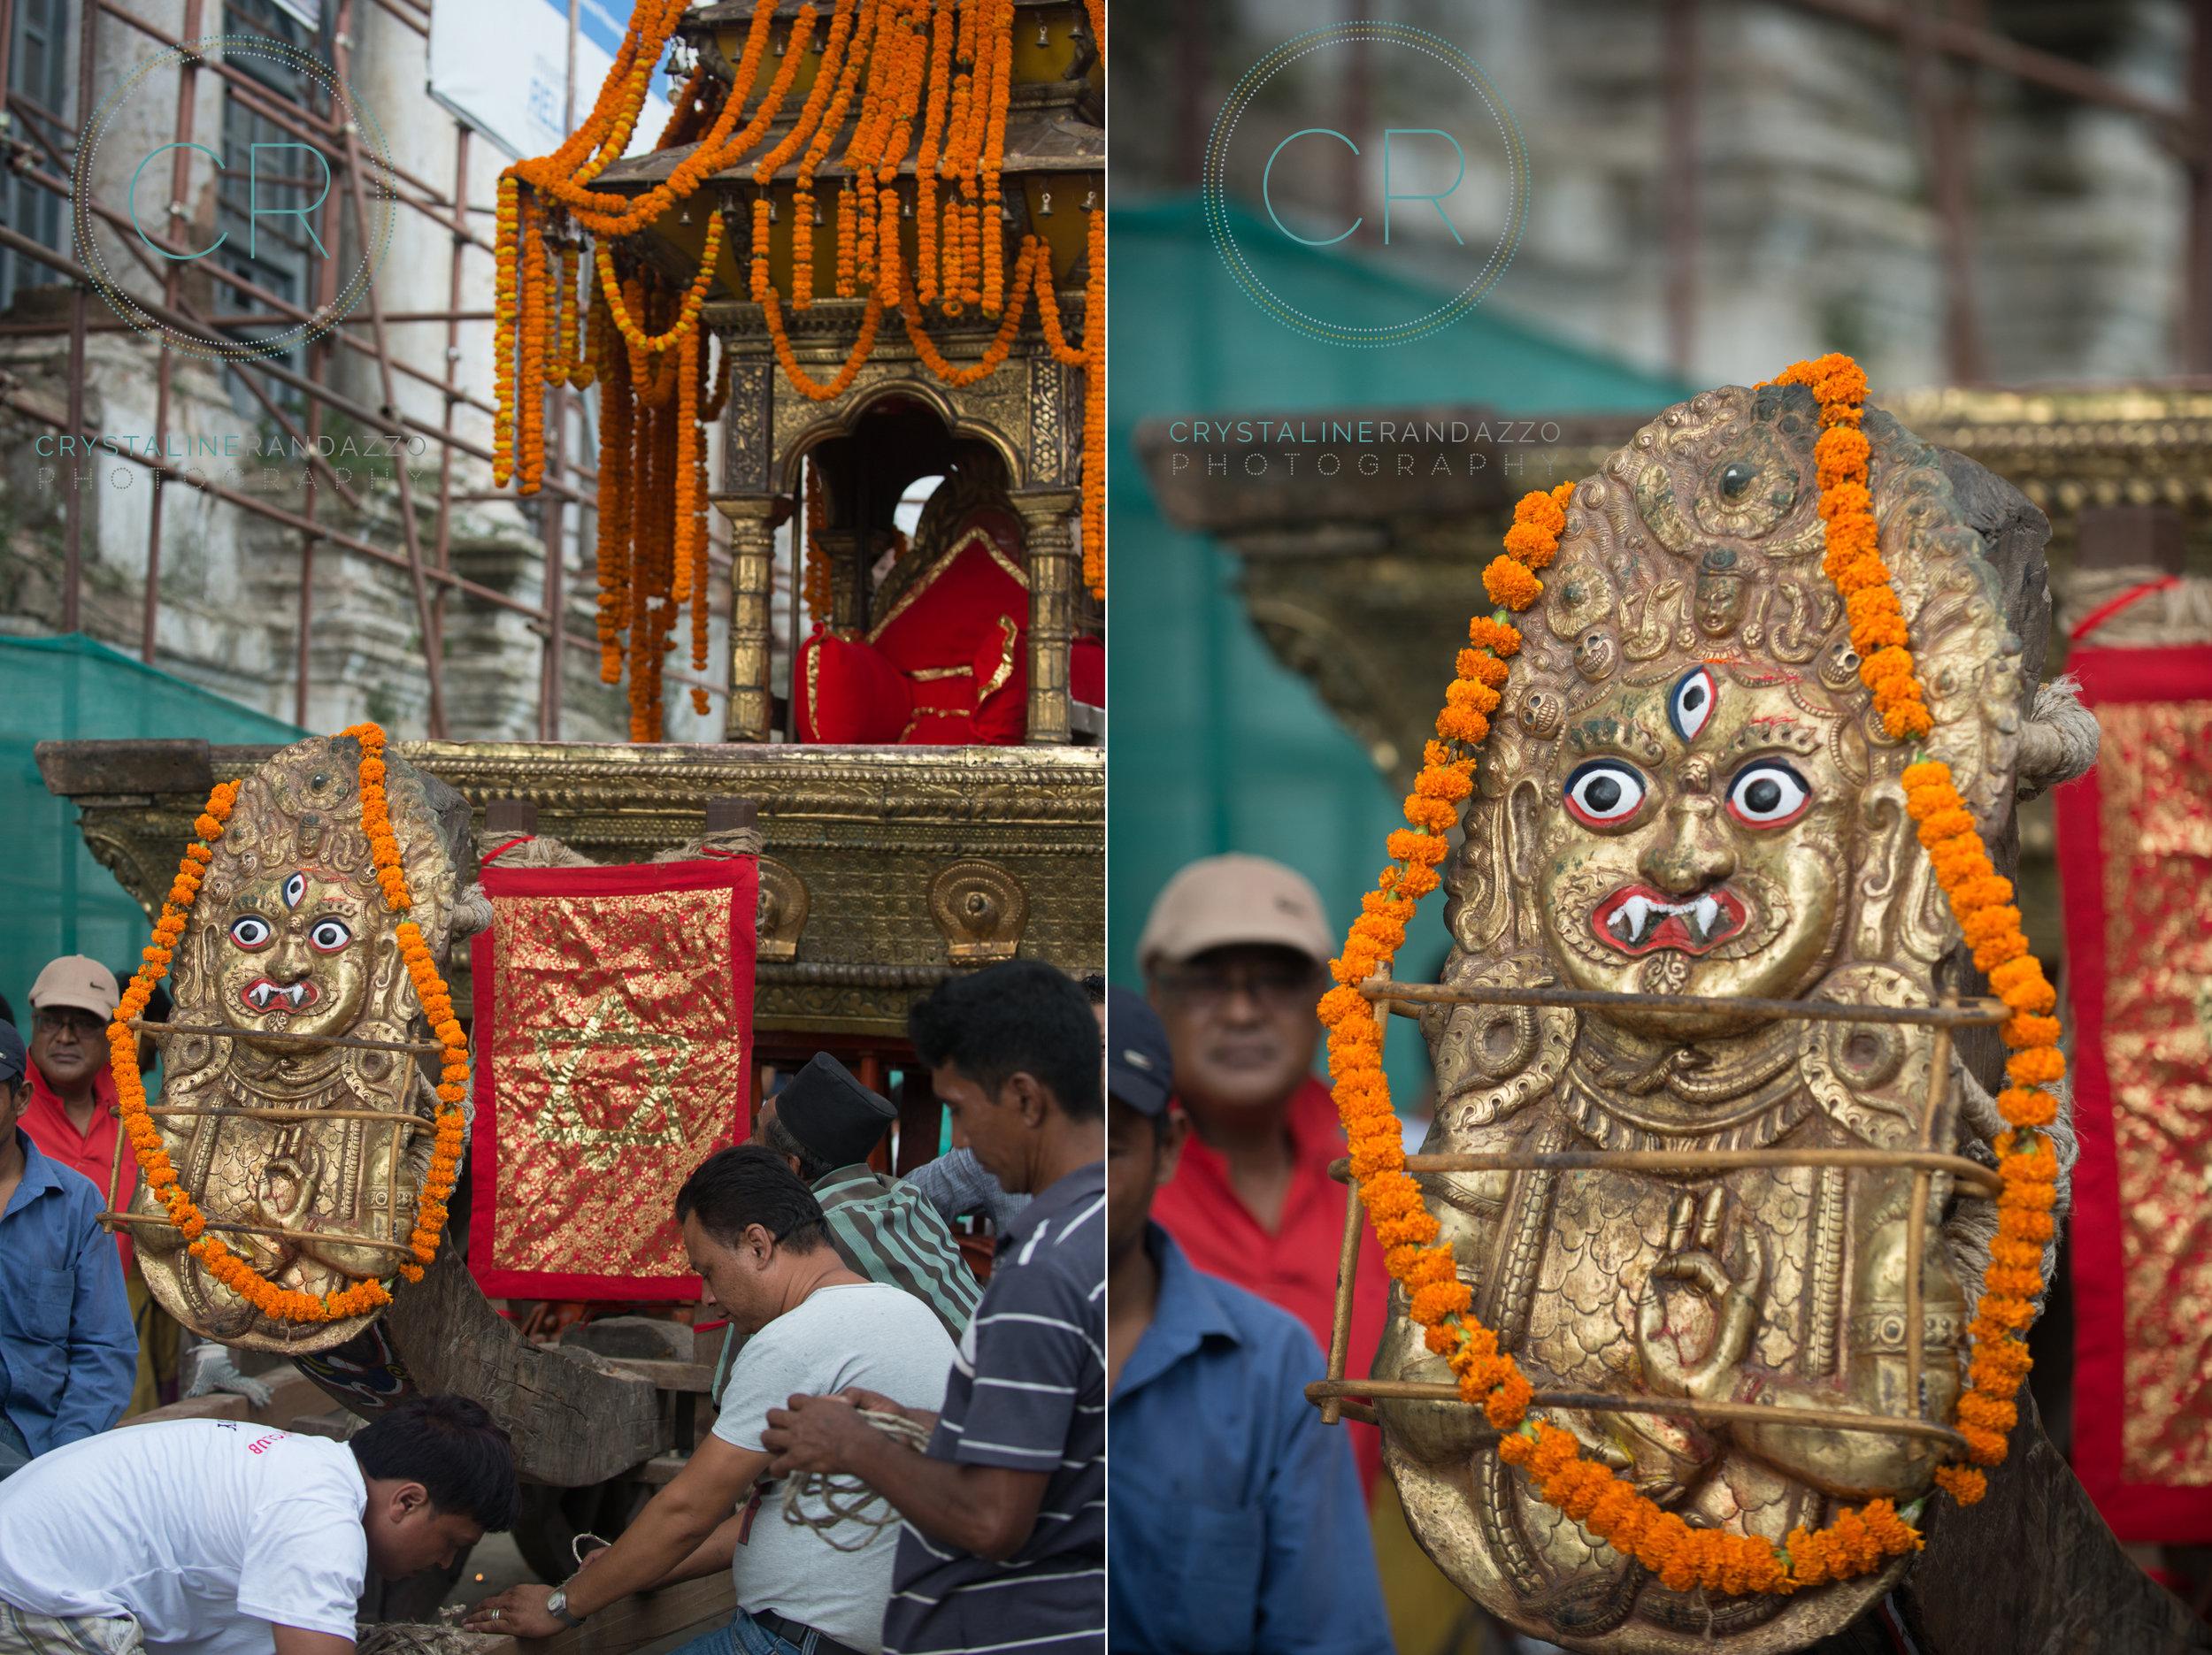 dyp_Randazzo_Kathmanduwanderings_20170905_00041.jpg